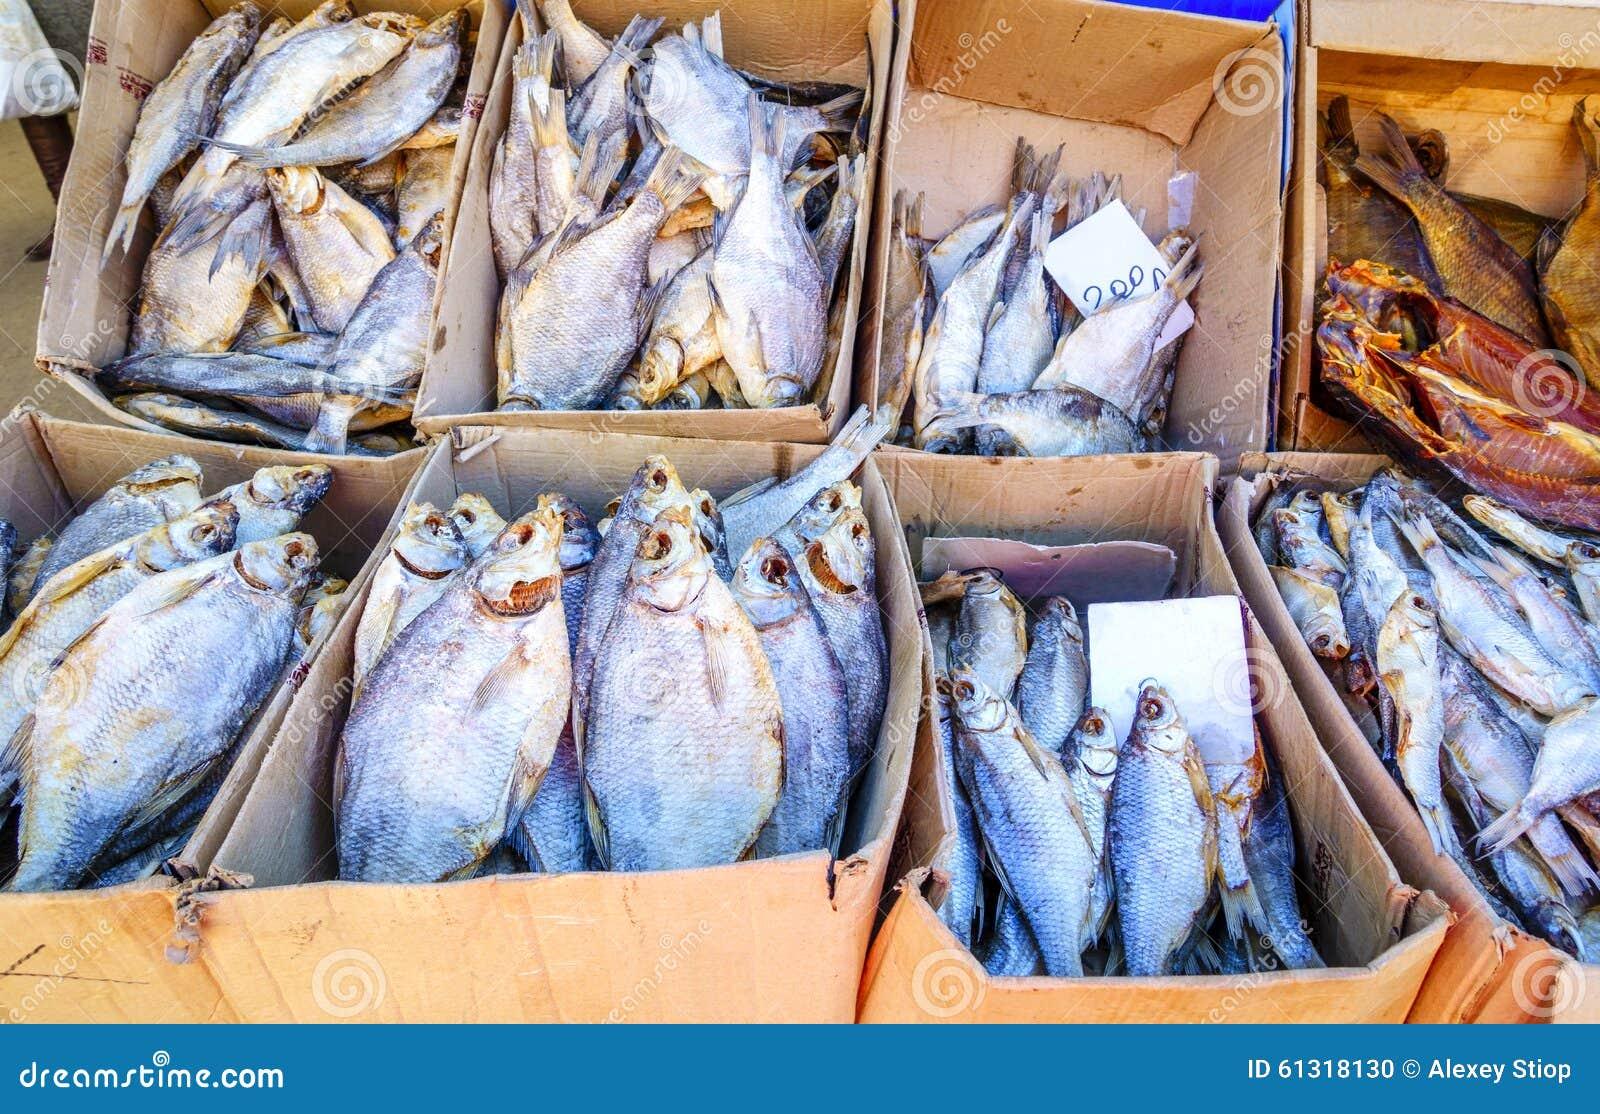 Starting dried fish business plan